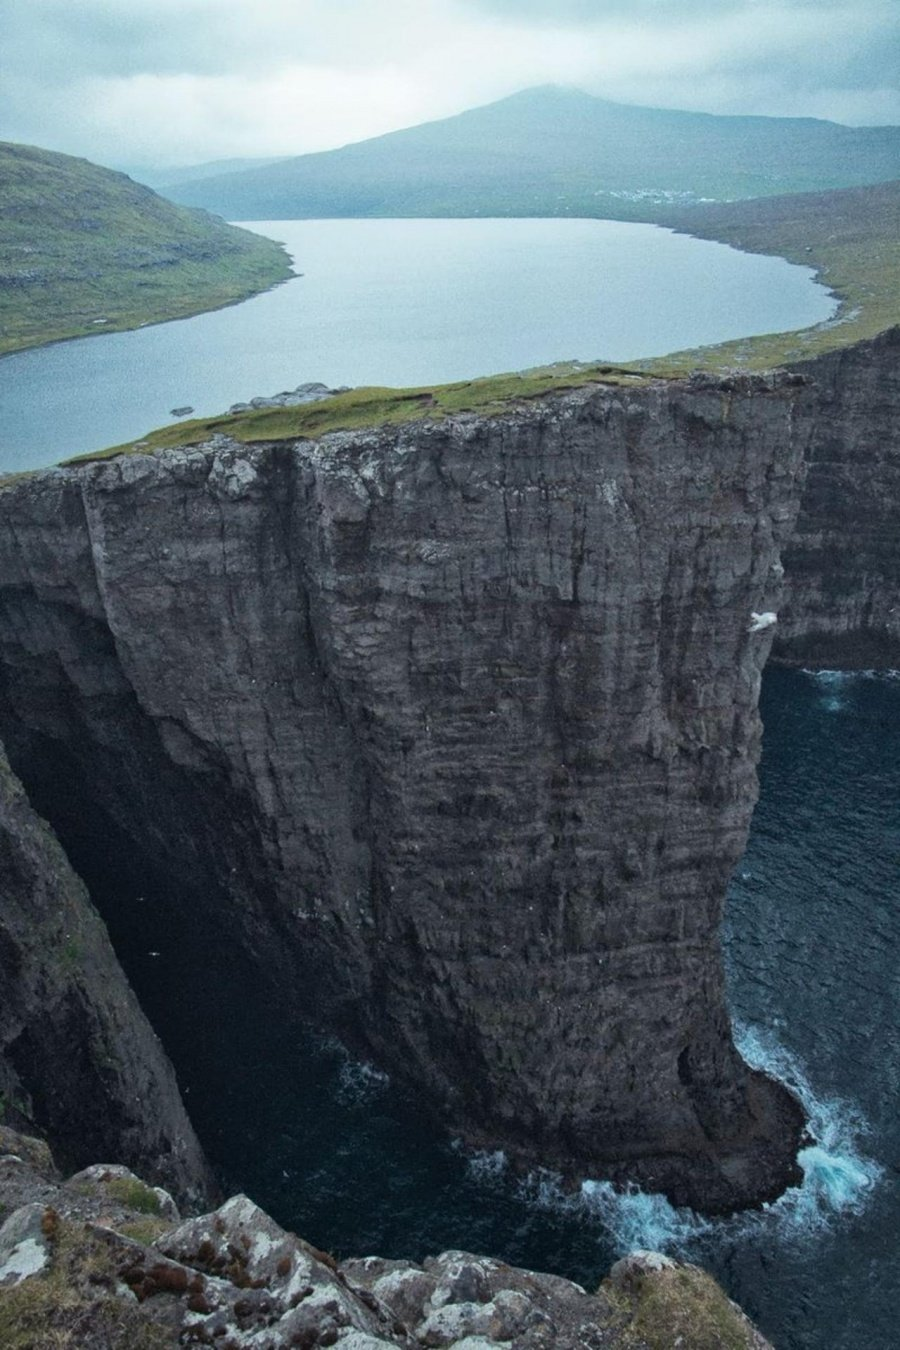 15 мест на земле, похожих на пейзажи других планет